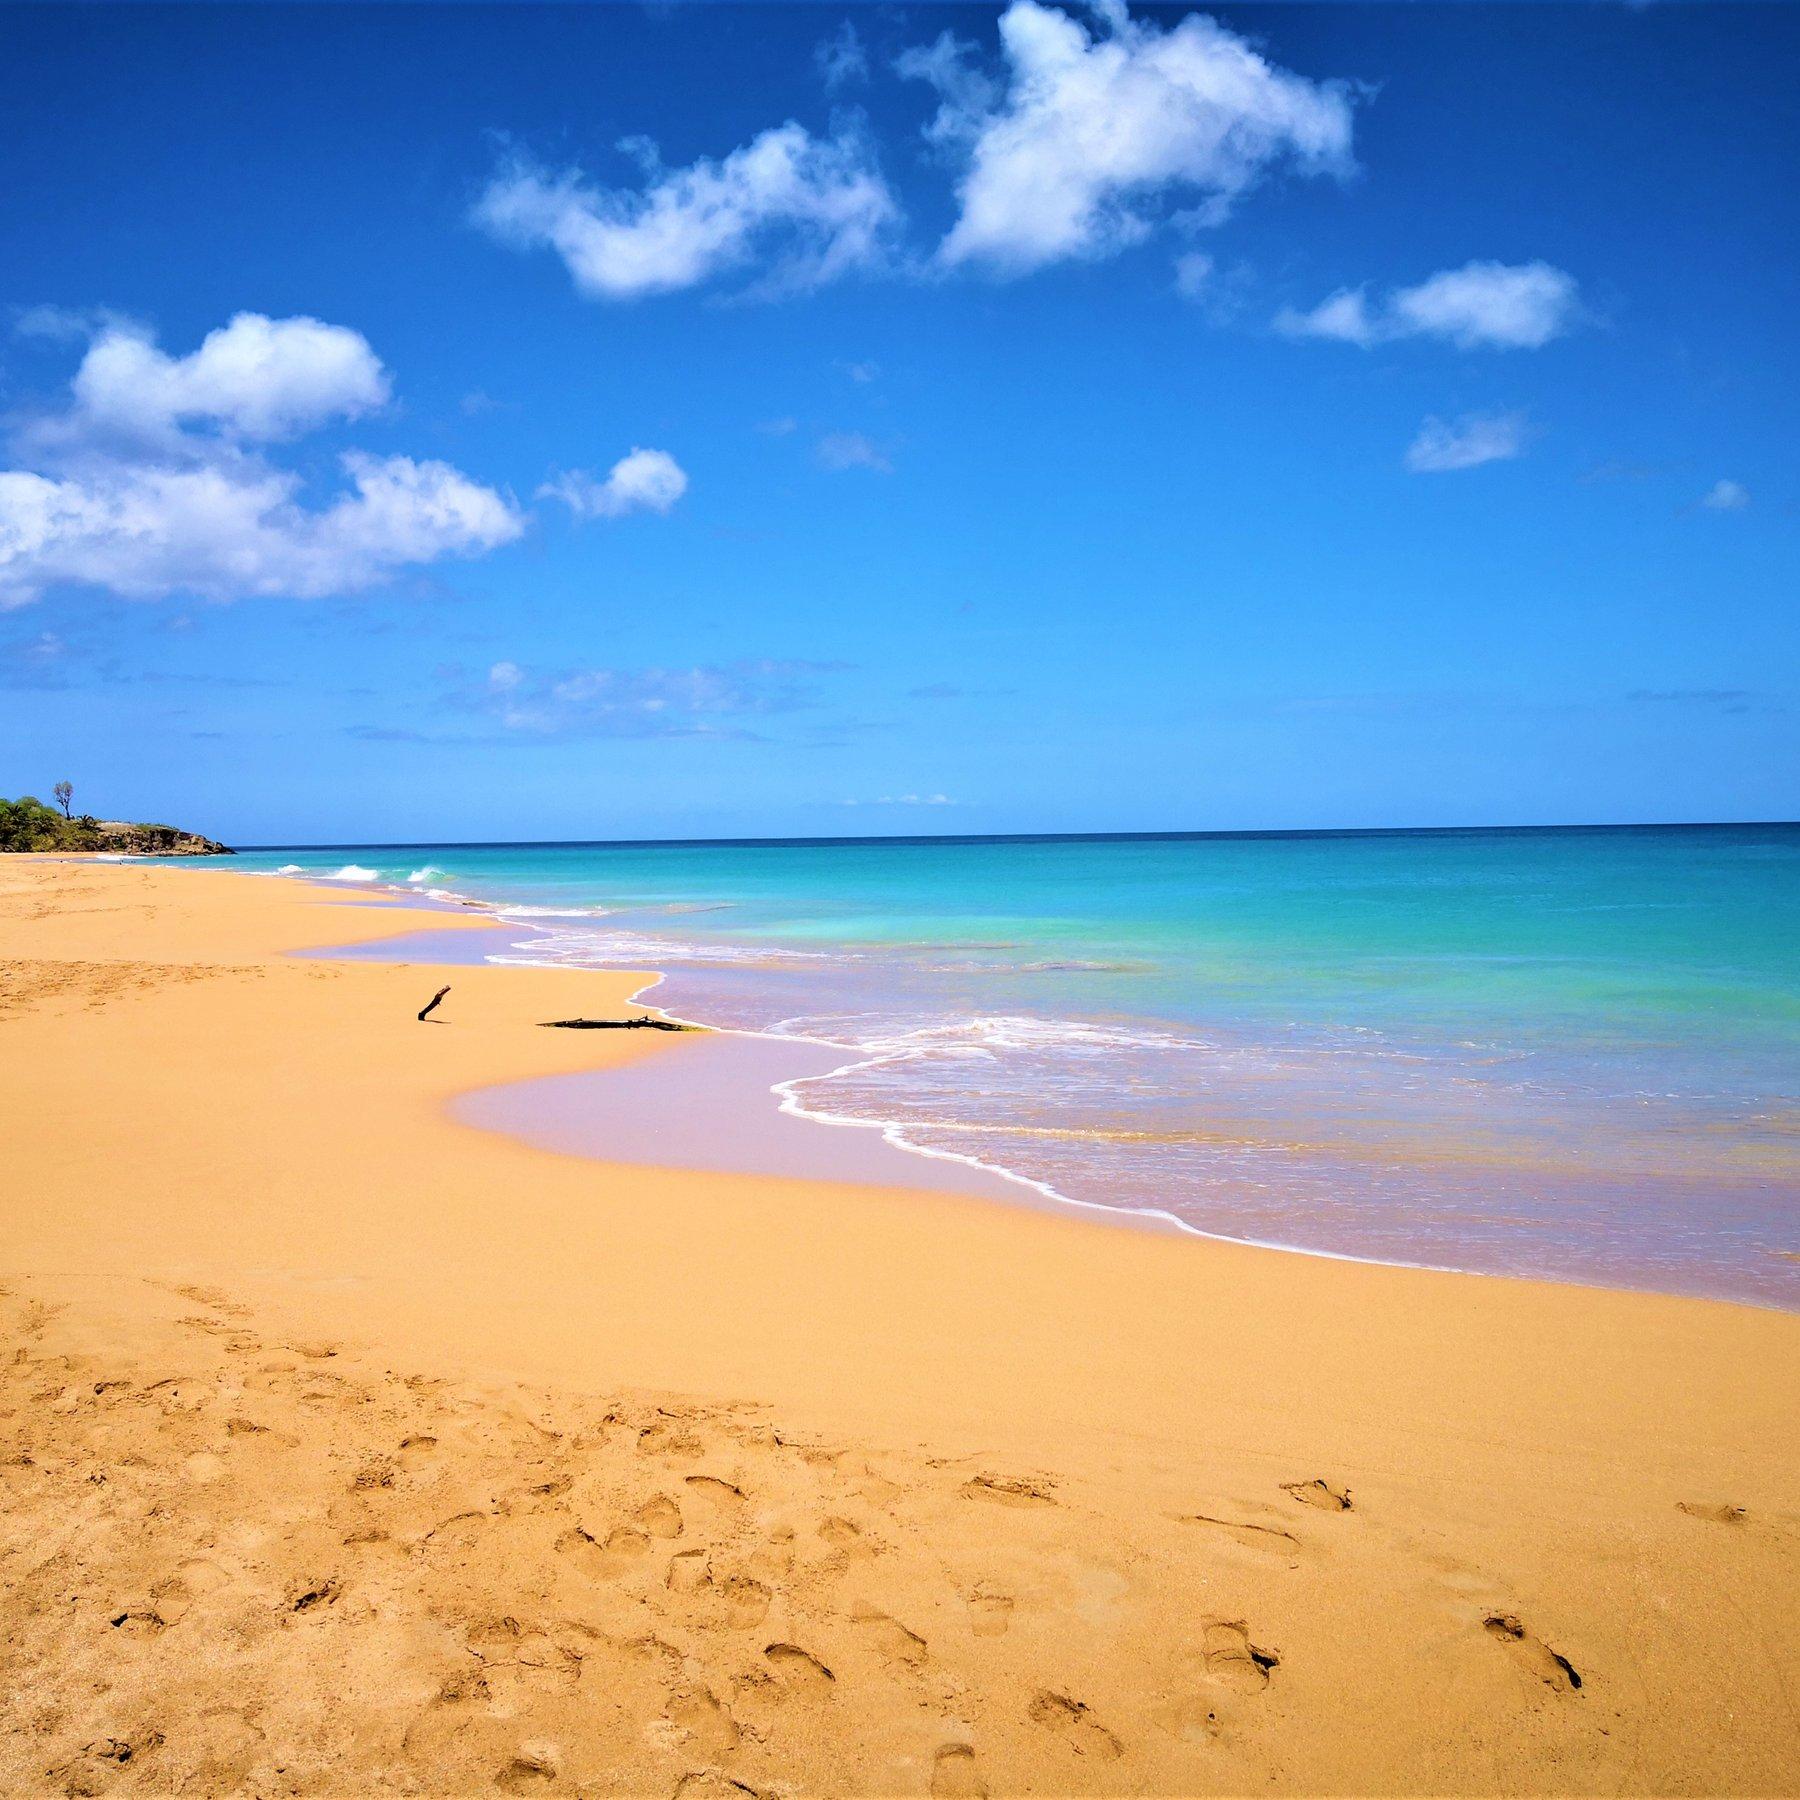 beach shore under blue sky during daytime